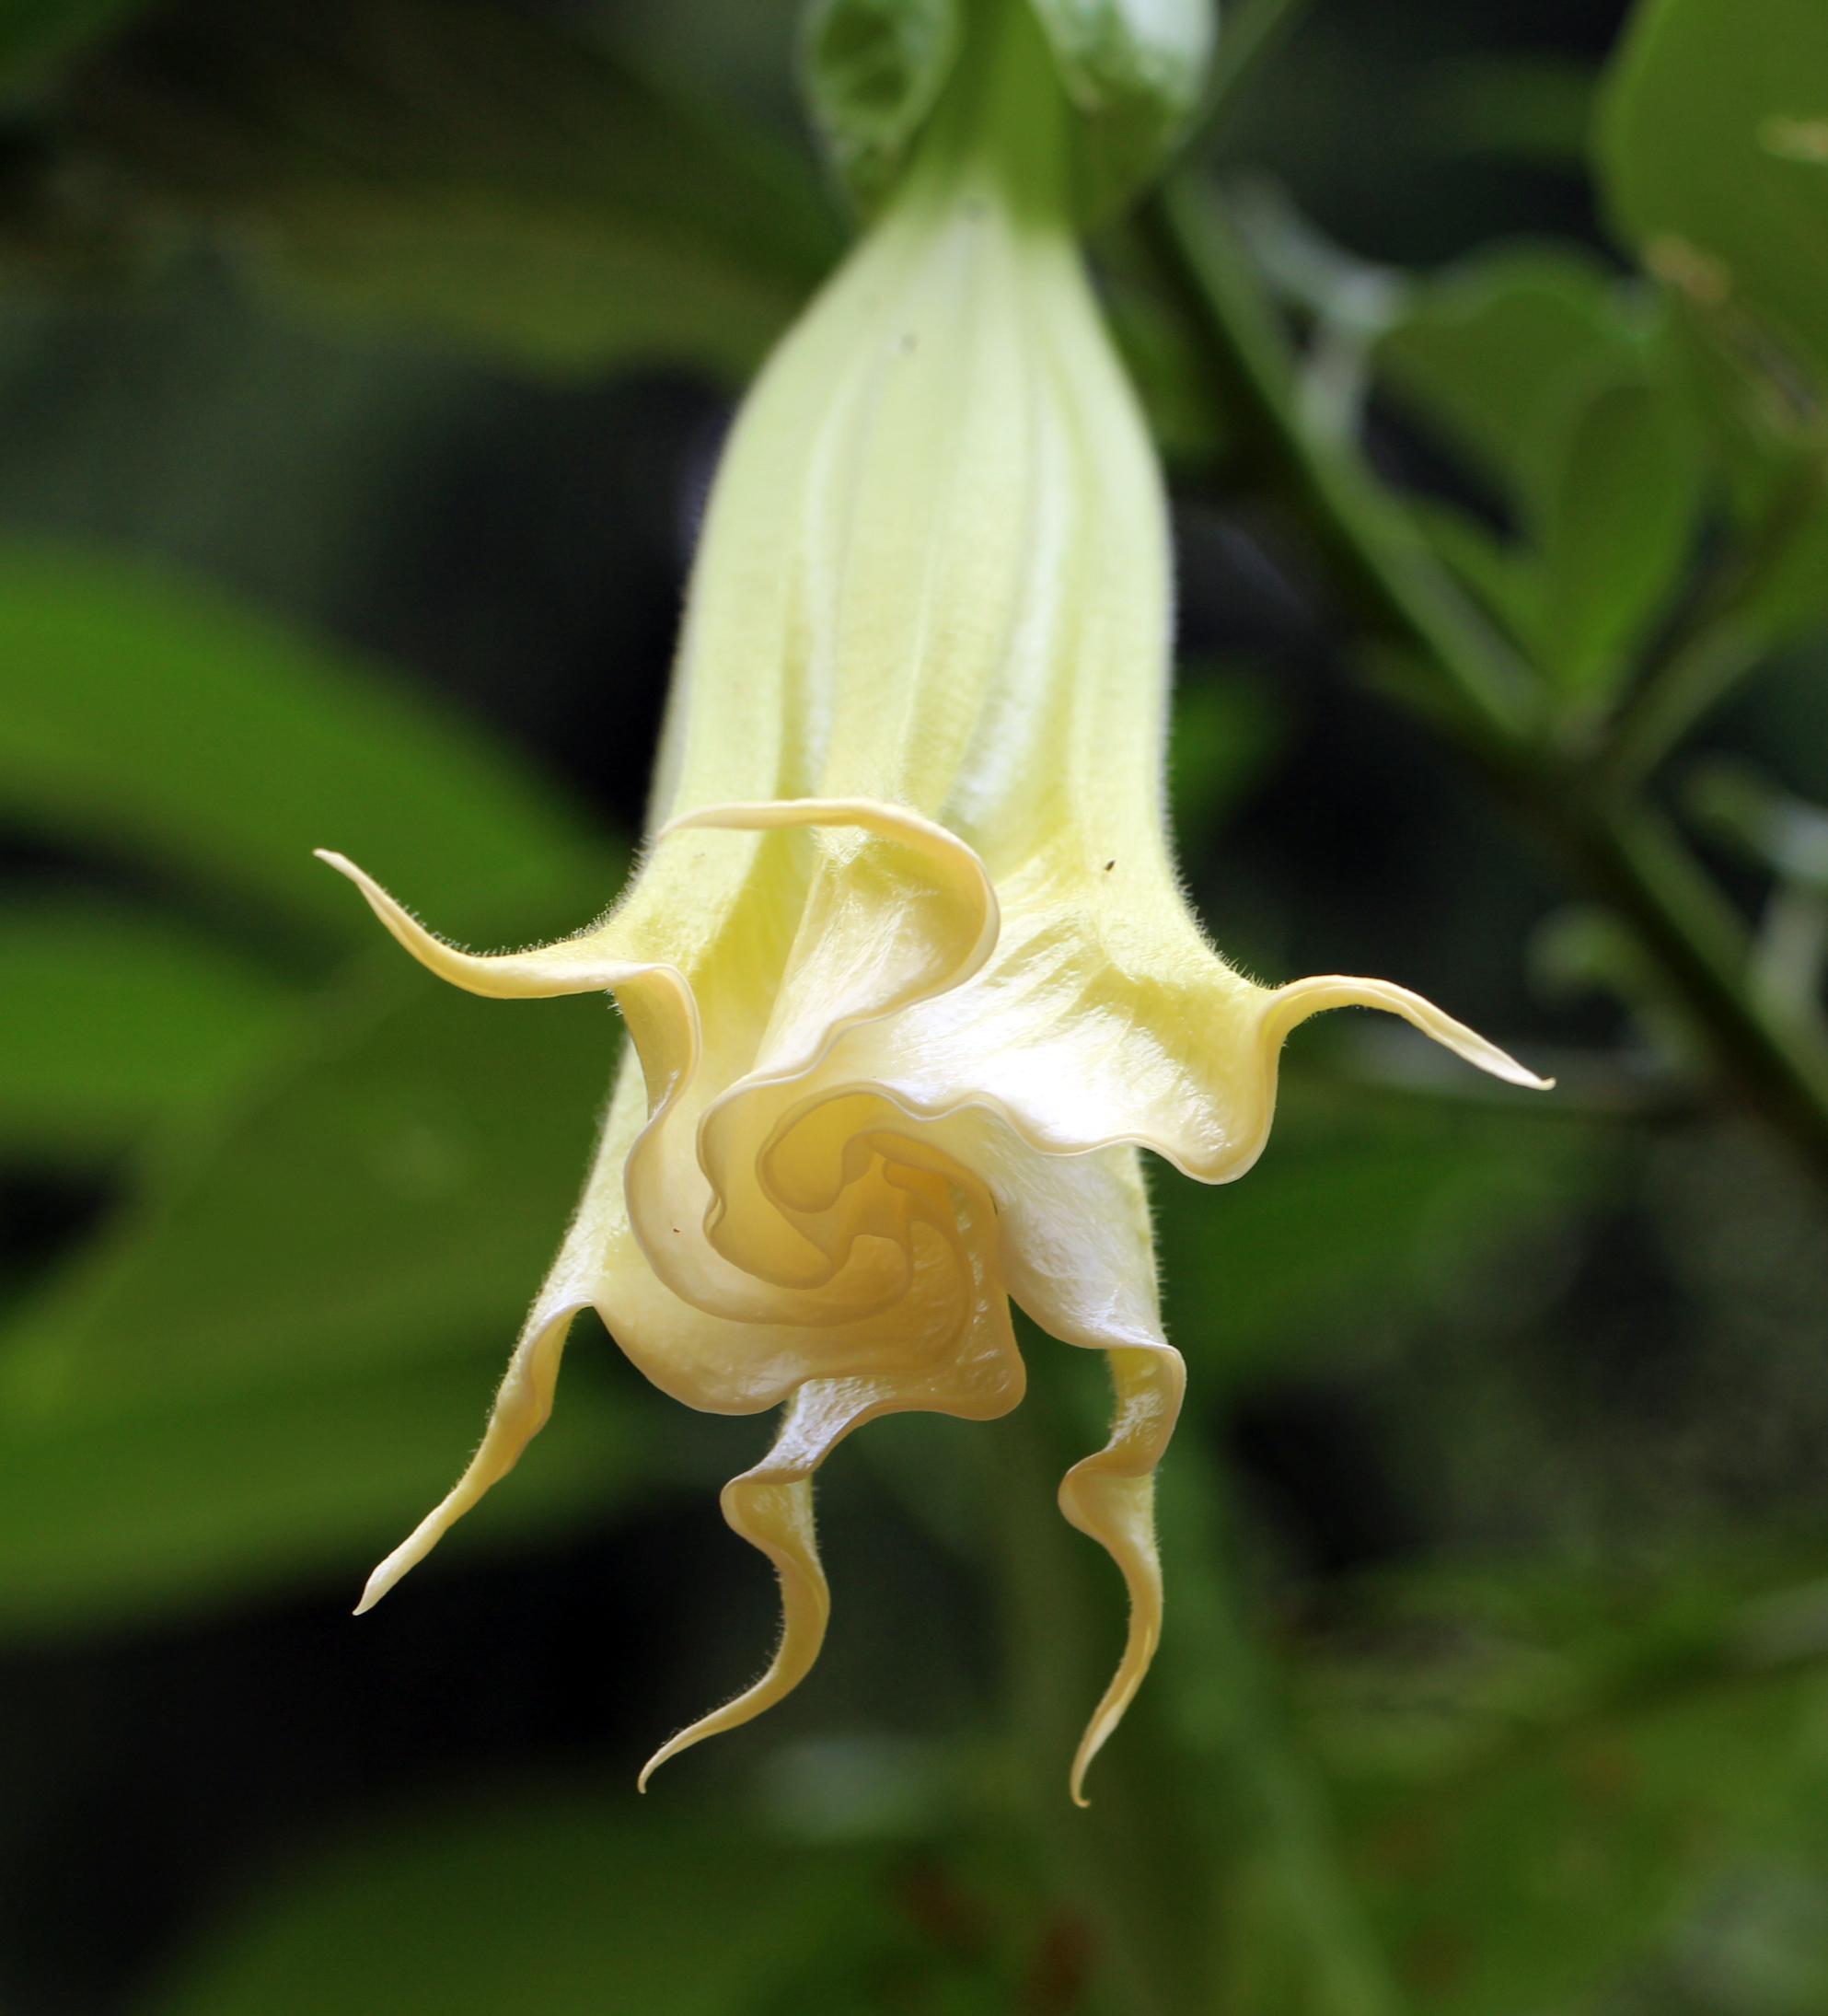 https://upload.wikimedia.org/wikipedia/commons/0/04/Rio_de_janeiro,_jardim_botanico,_brugmansia_suaveolens.JPG